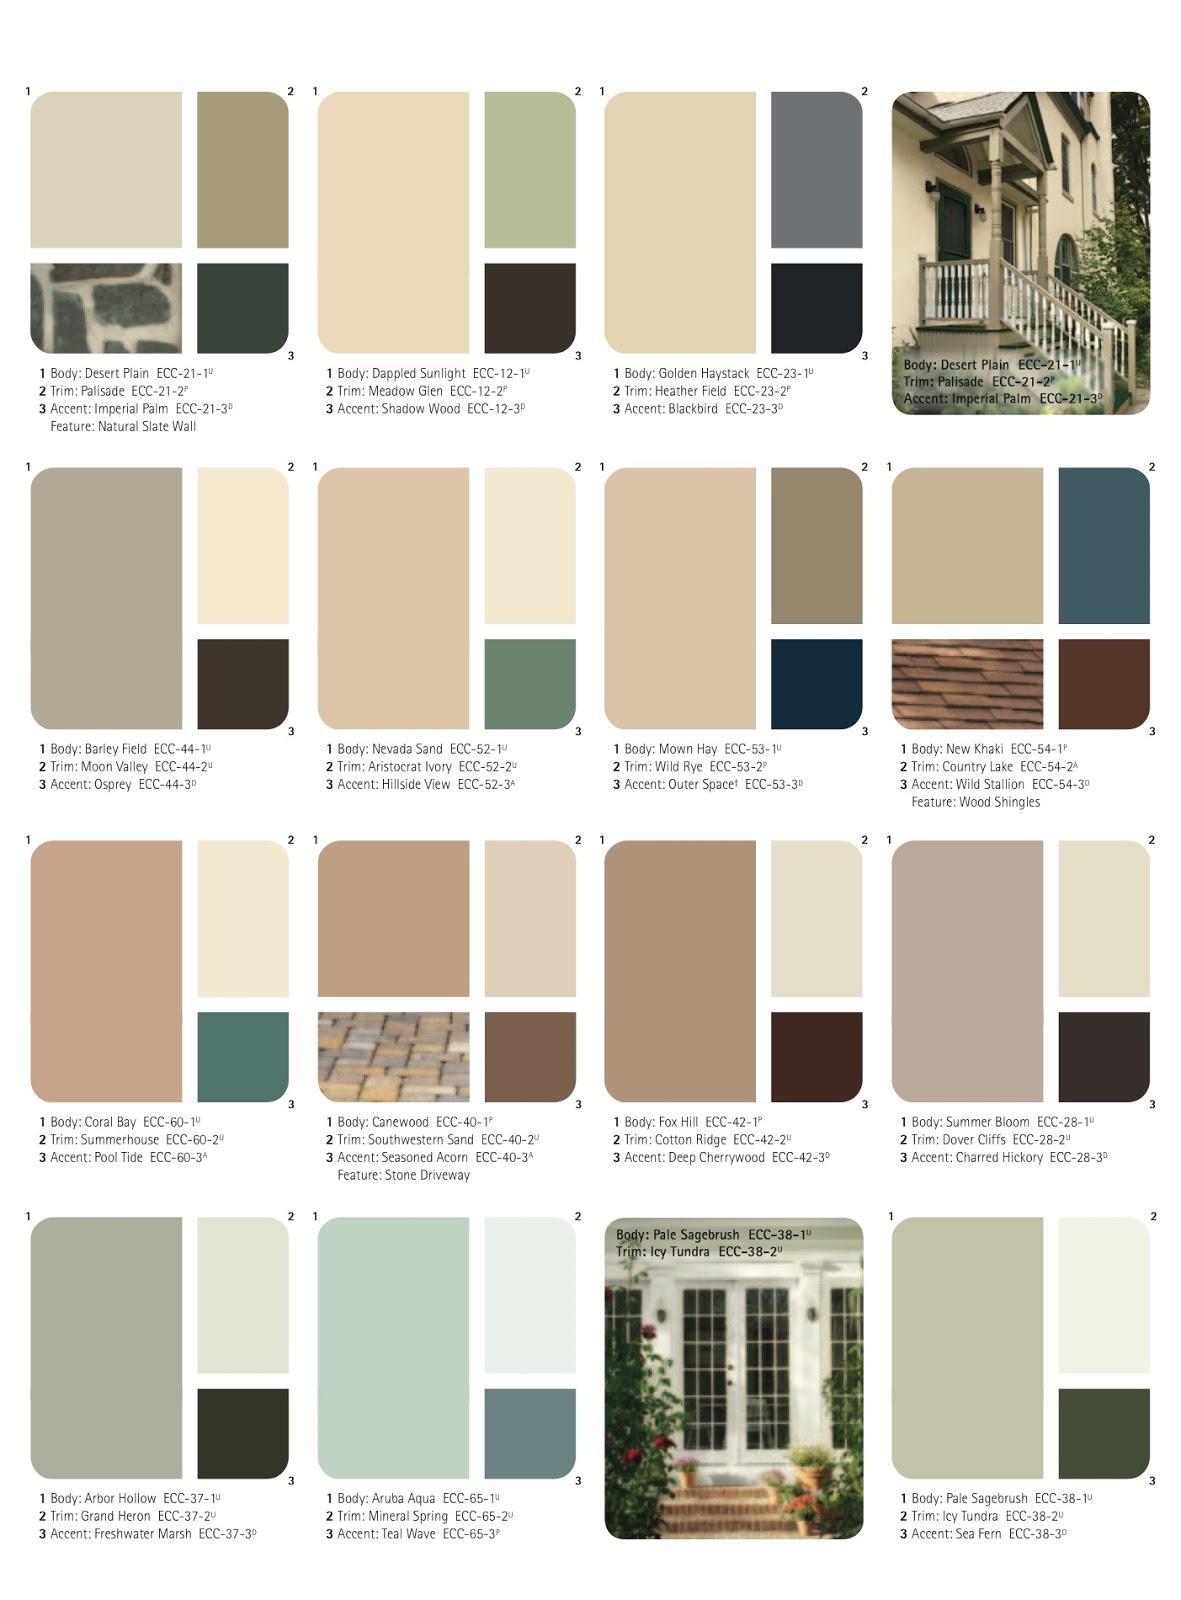 Terrific Anges Dollhouse Choosing The Exterior Color Scheme Largest Home Design Picture Inspirations Pitcheantrous